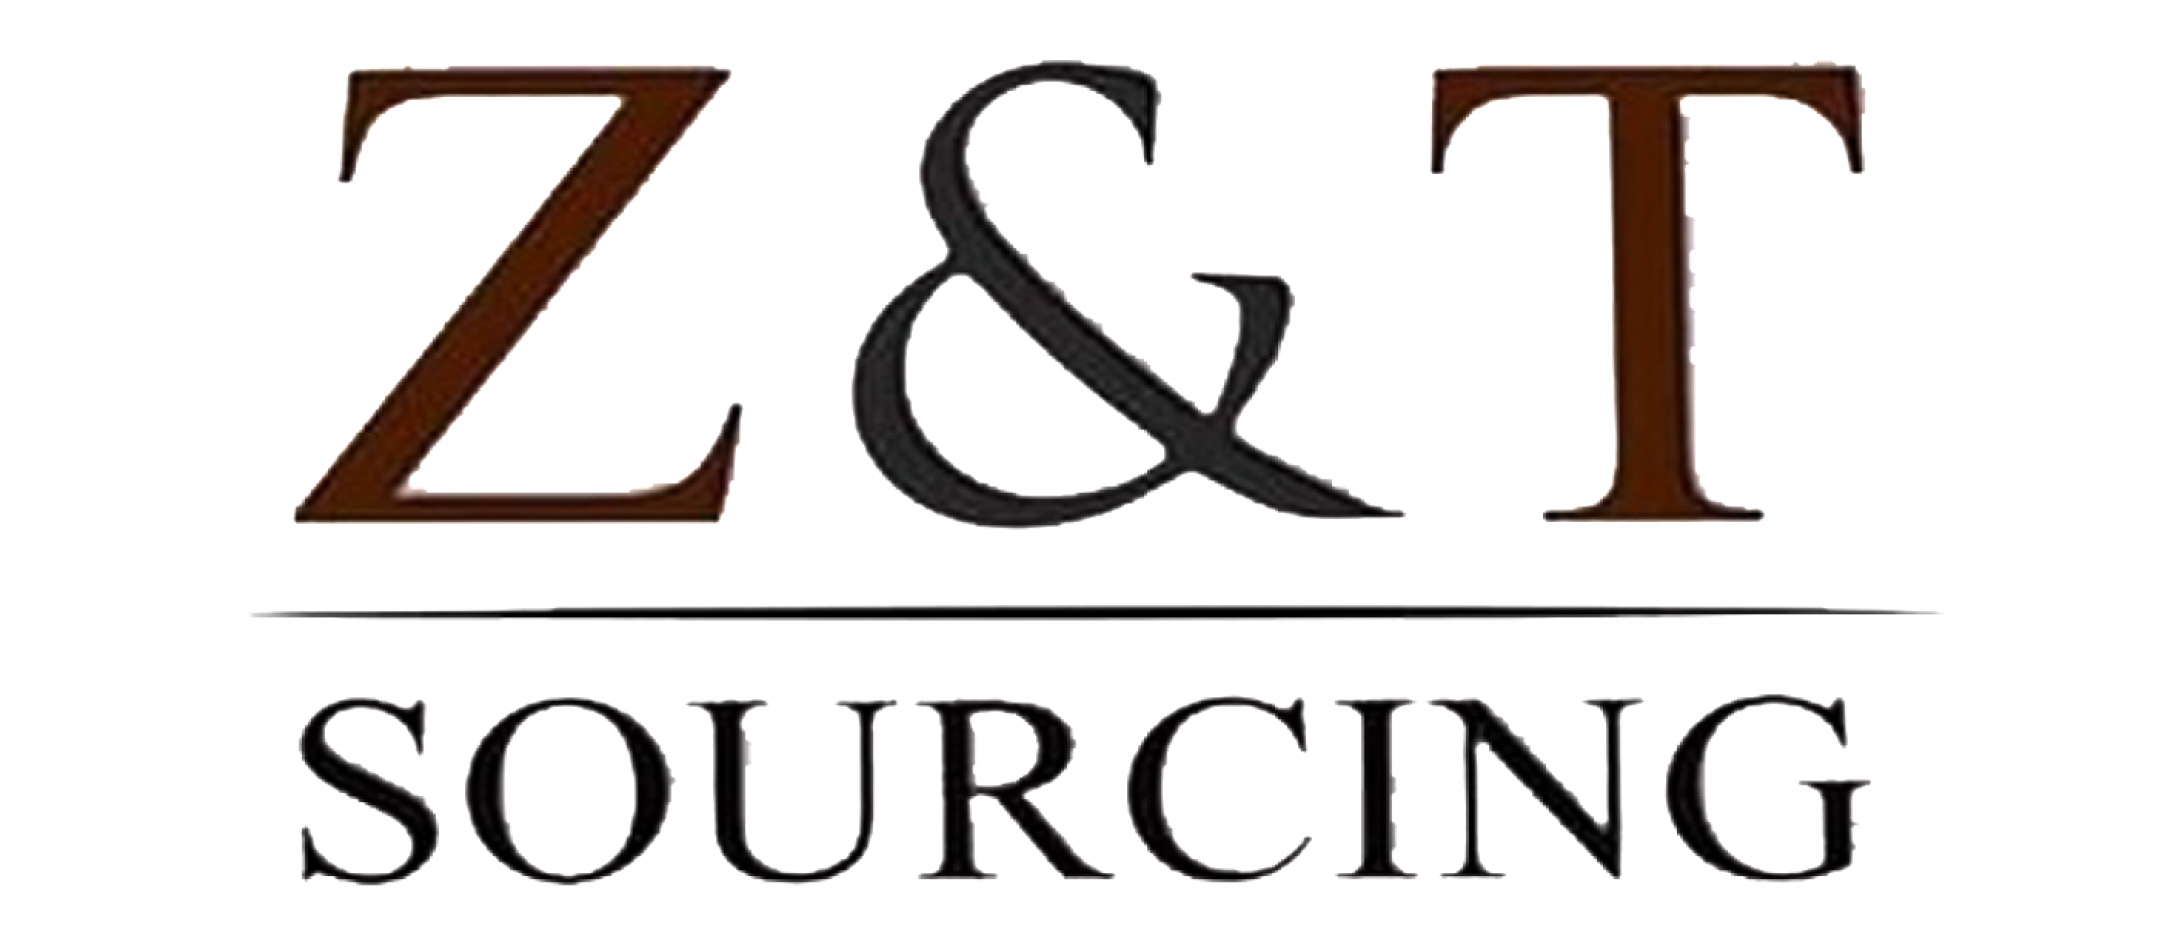 Z&T Sourcing